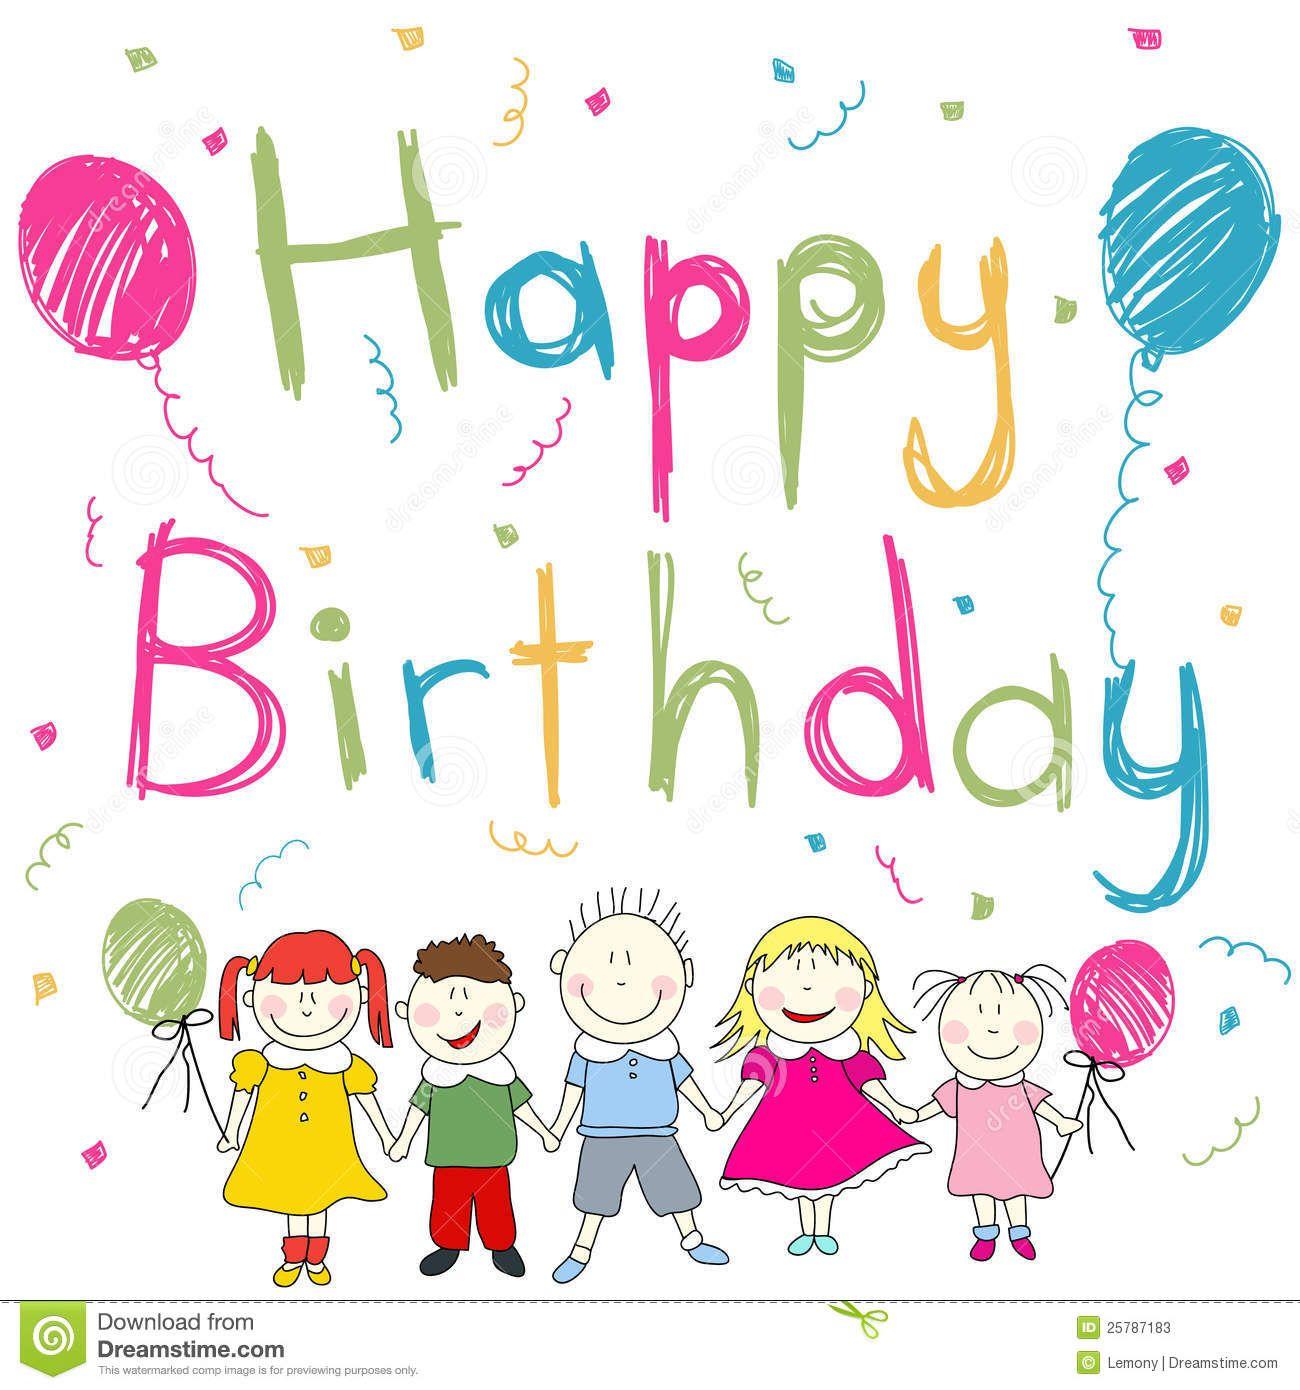 Tarjetita de Cumpleaños para Niños Tarjetitas de Cumpleaños Pinterest Searching